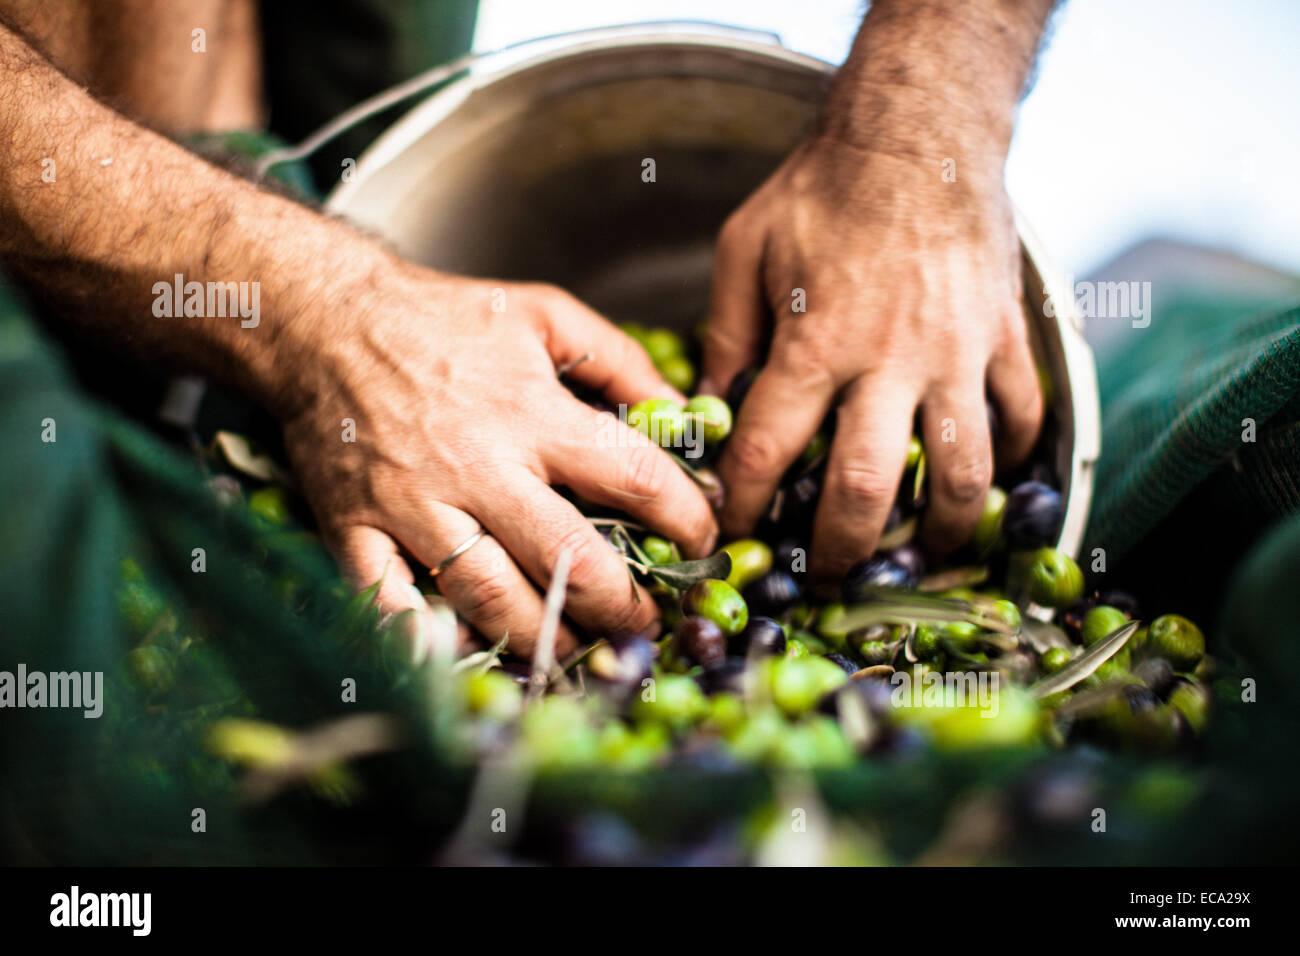 Man pushing olives in bucket - Stock Image